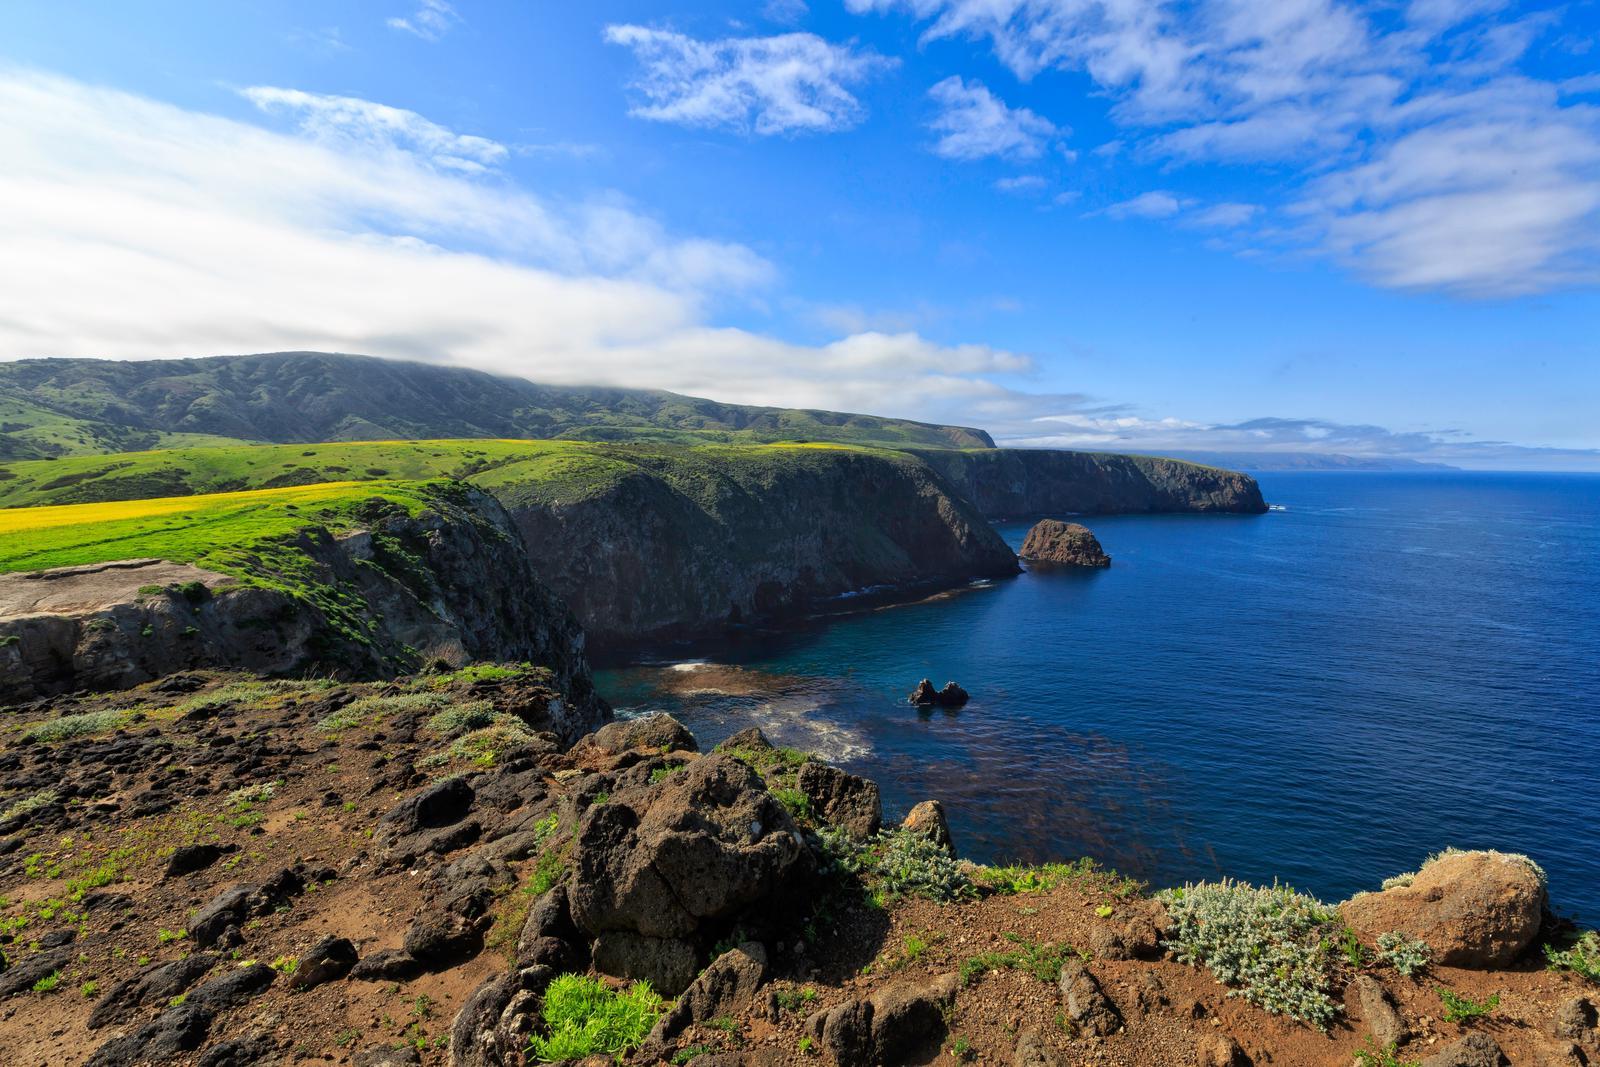 Coastal bluff overlooking rugged, steep cliffs with ocean below. Cavern Point, Santa Cruz Island